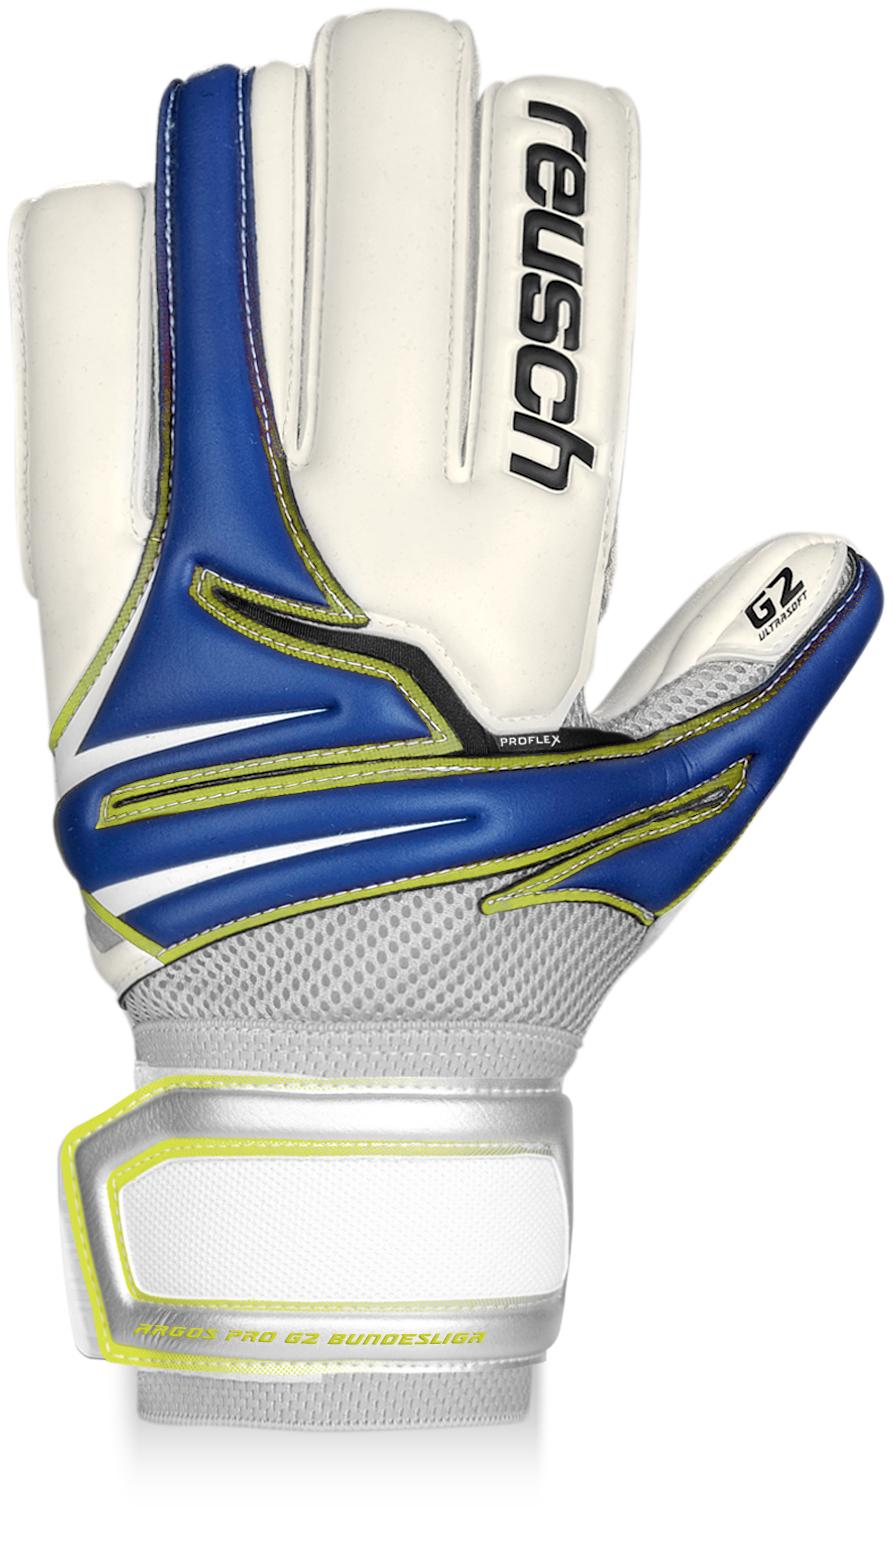 Reusch Argos Pro G2 Bundesliga Goalkeeper Gloves